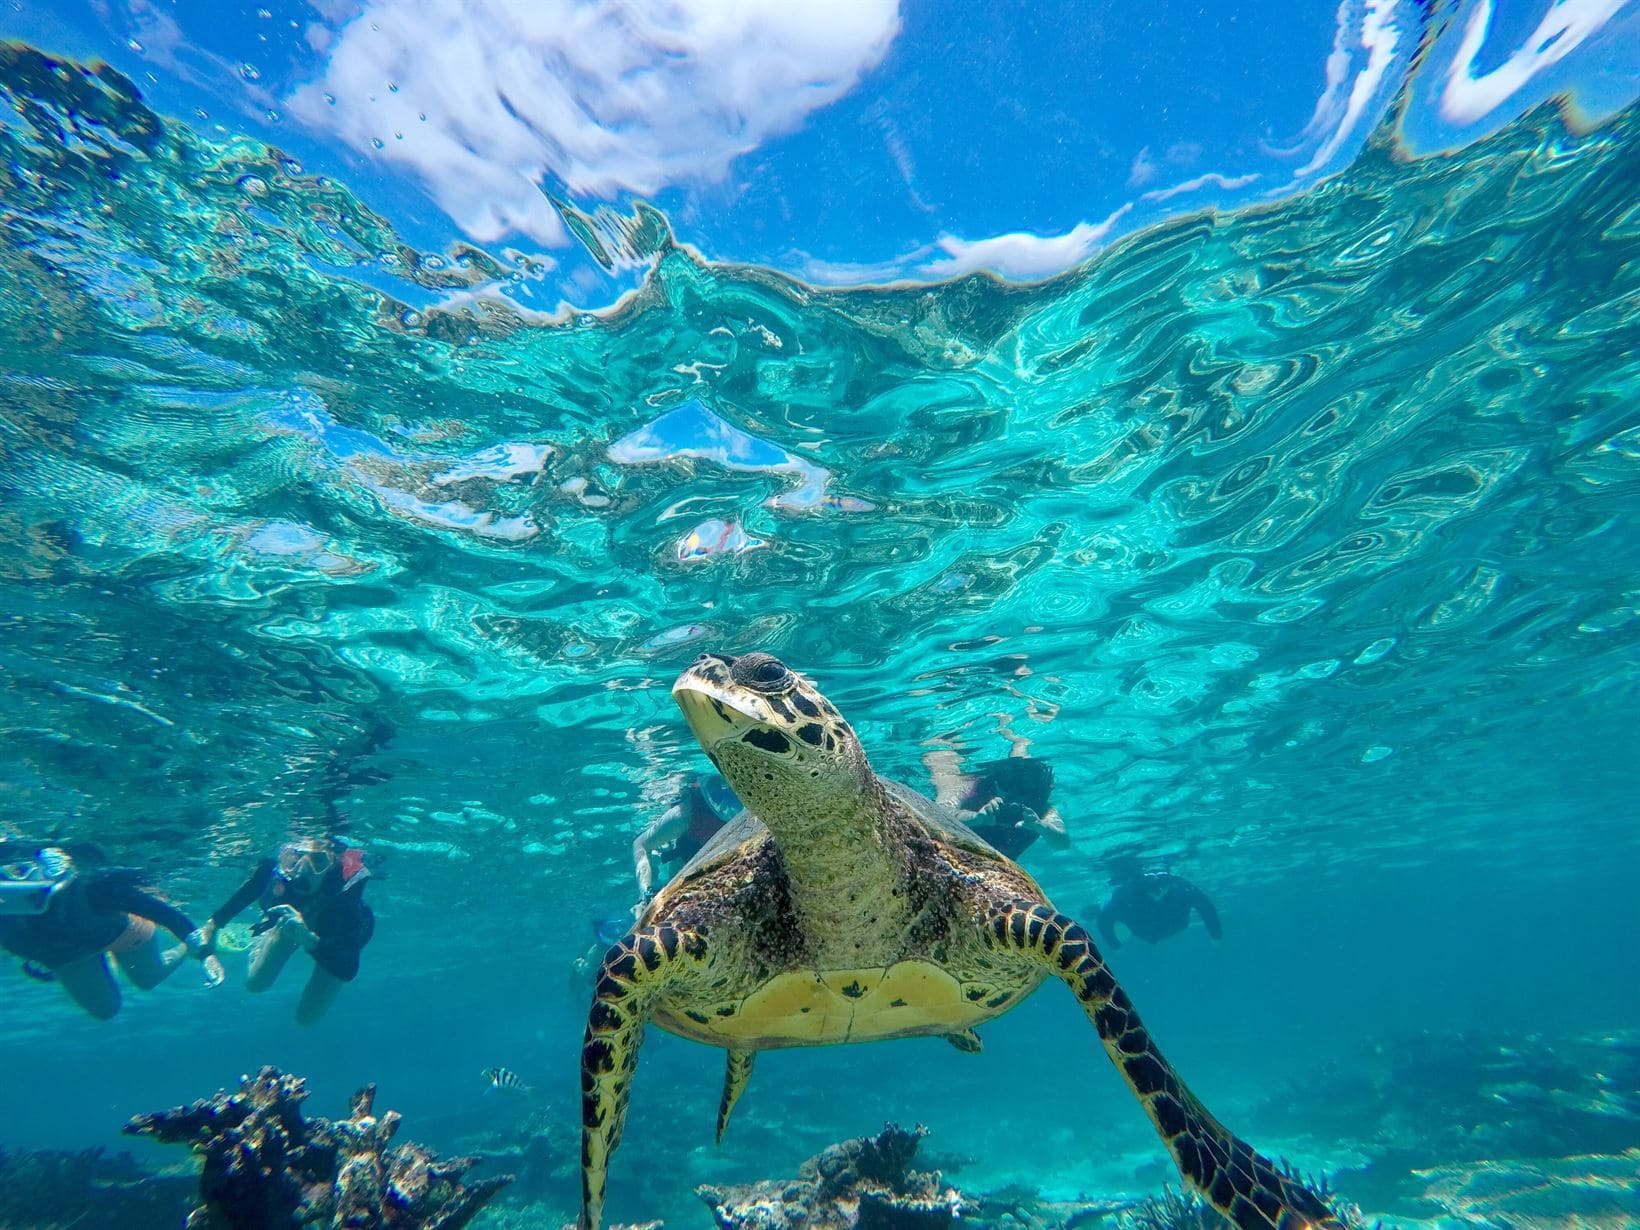 tartaruga marinha maldivas